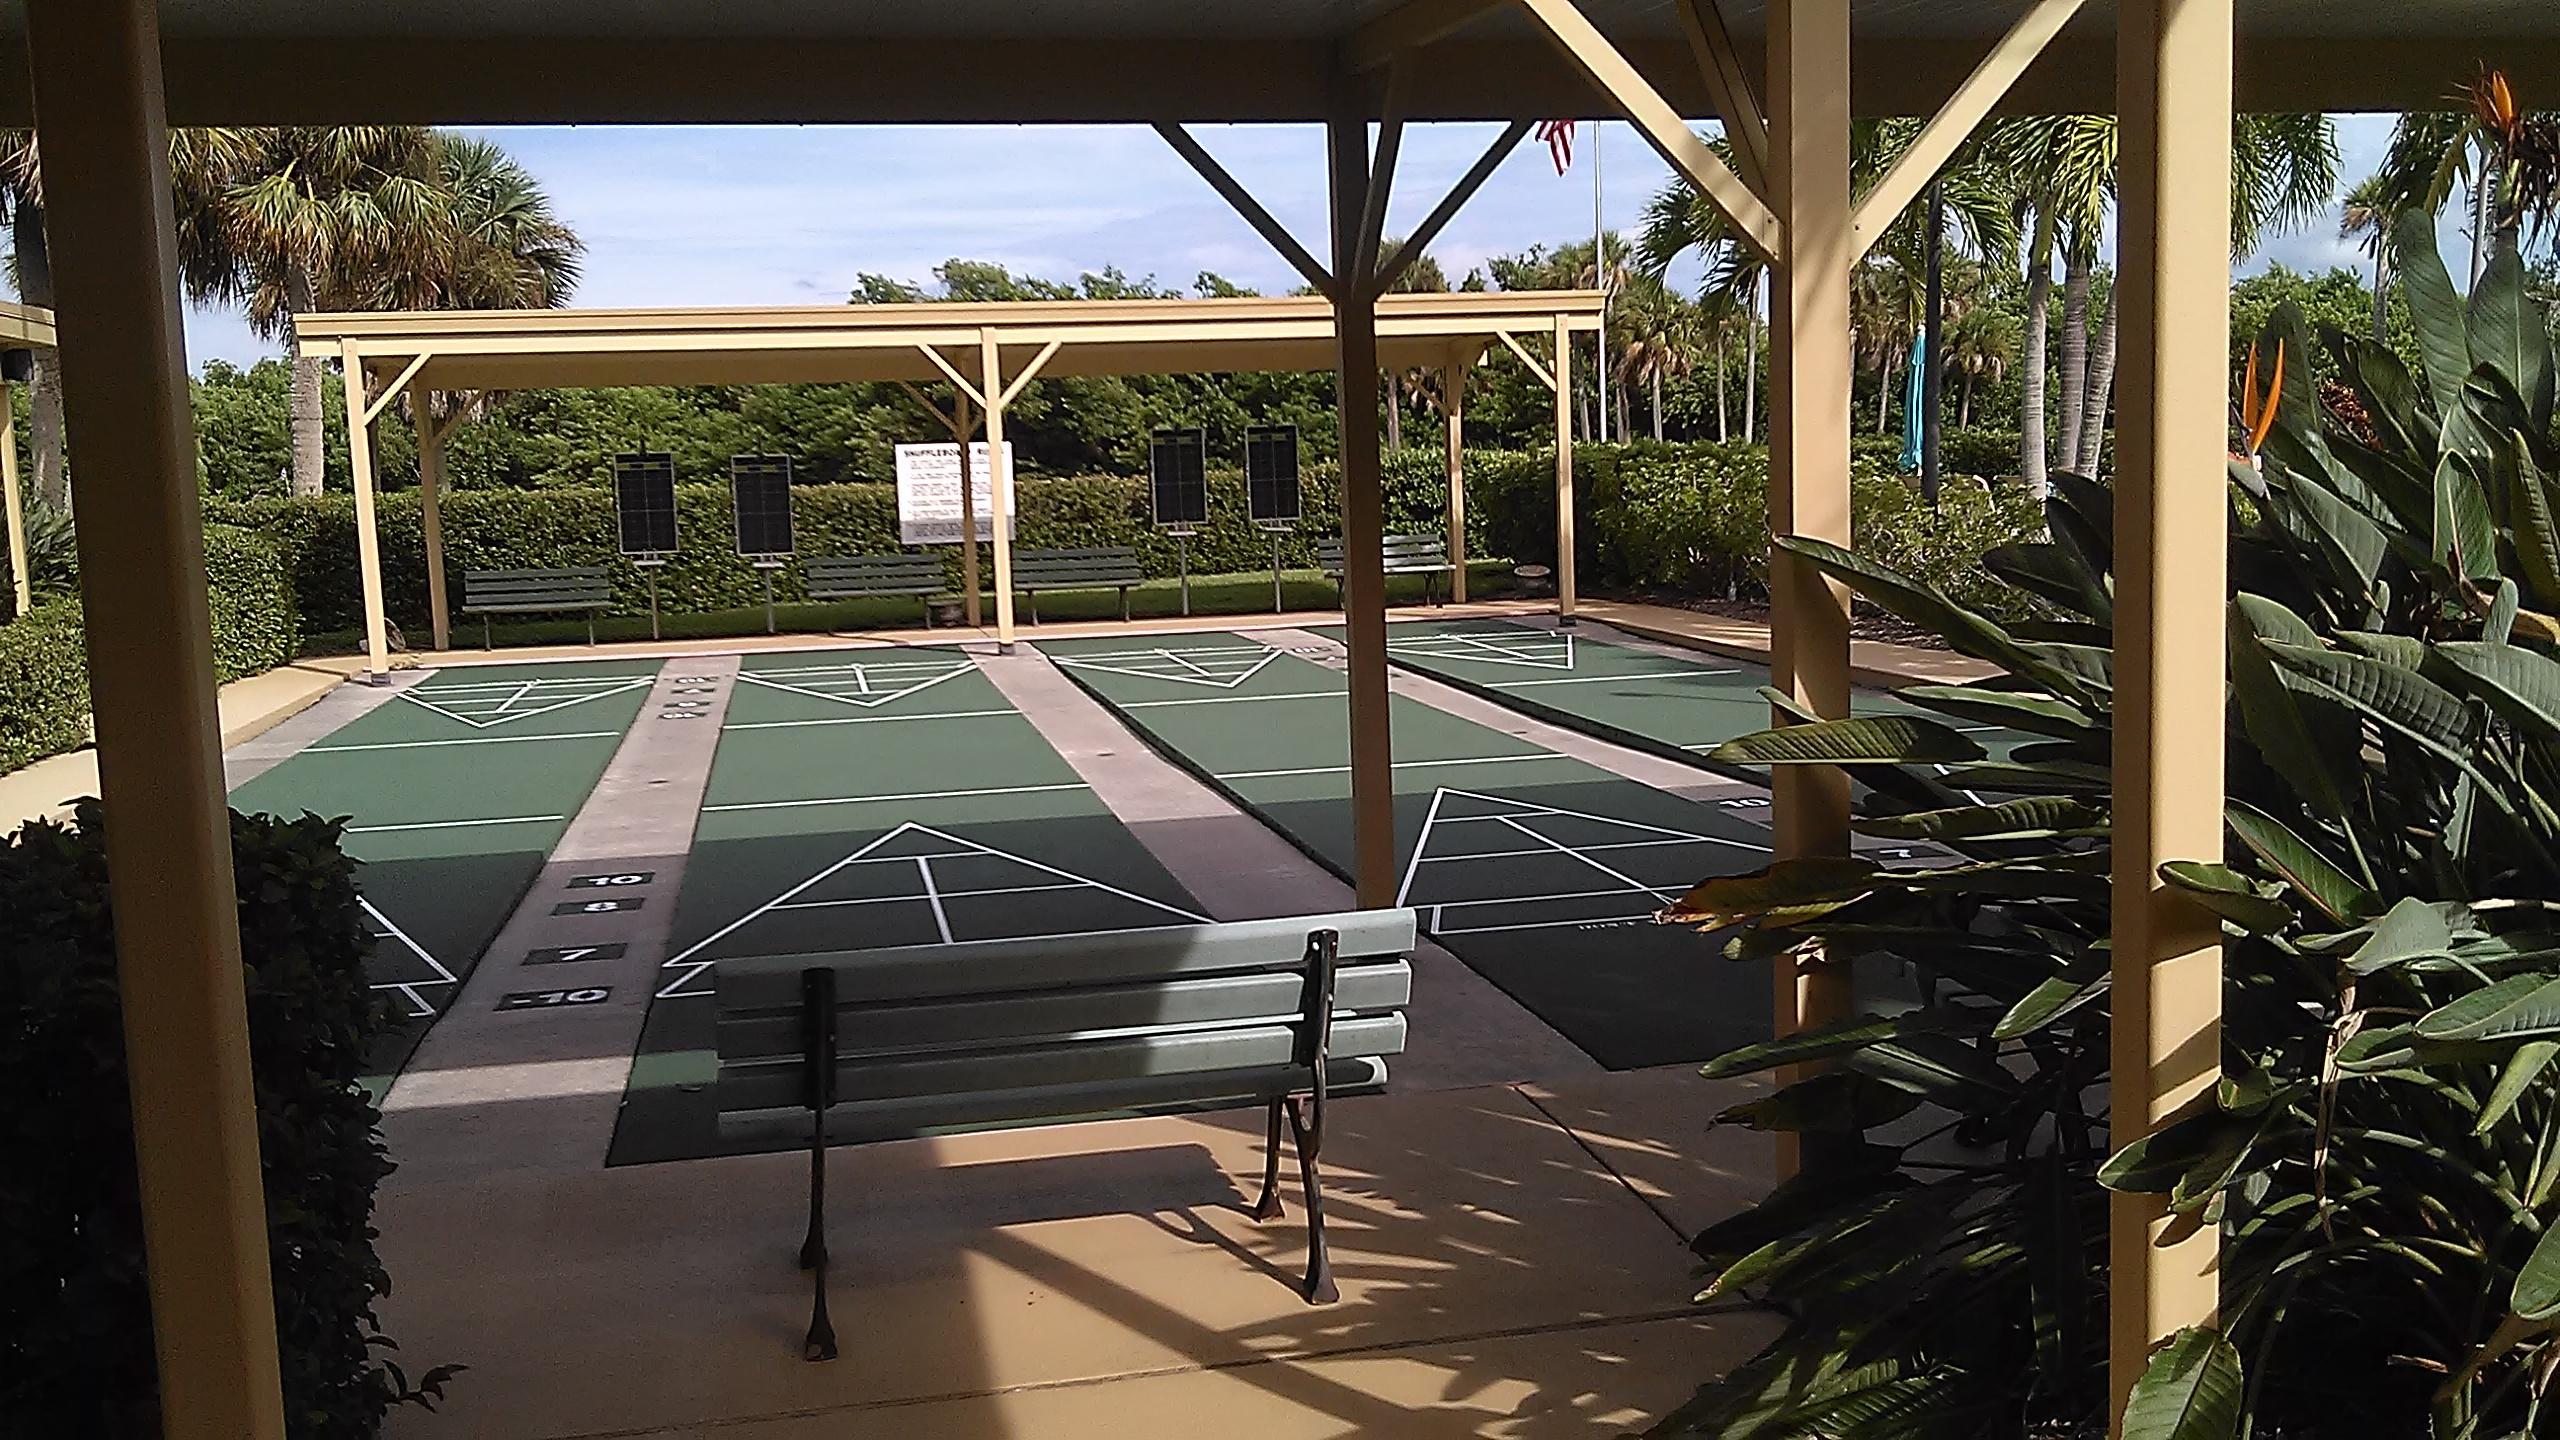 35 Vista Gardens Trail, Vero Beach, FL 32962